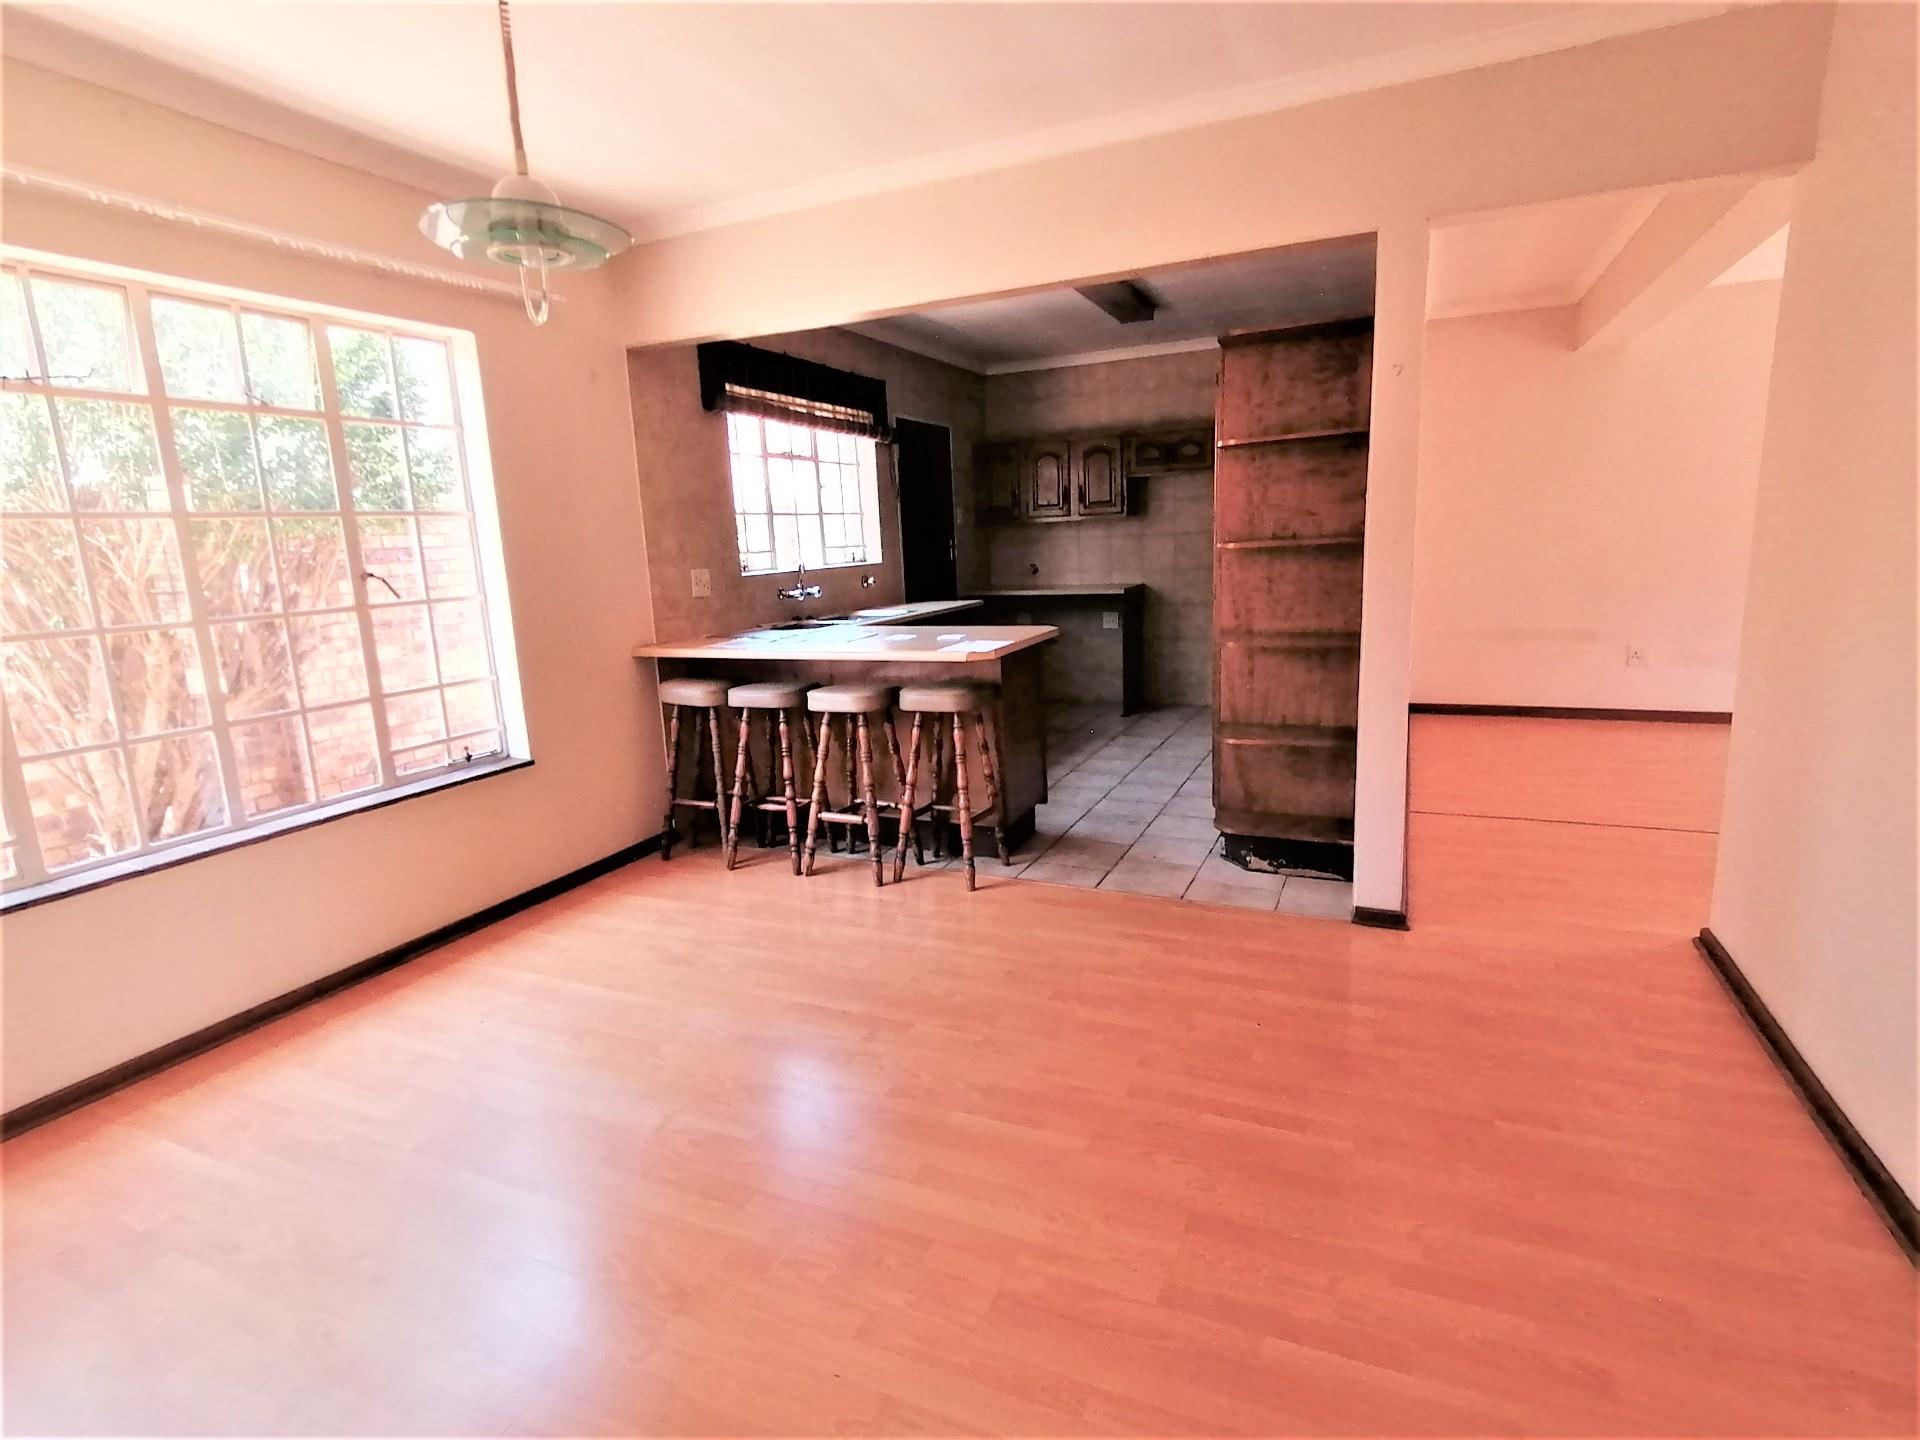 3 Bedroom Simplex For Sale in Brackendowns